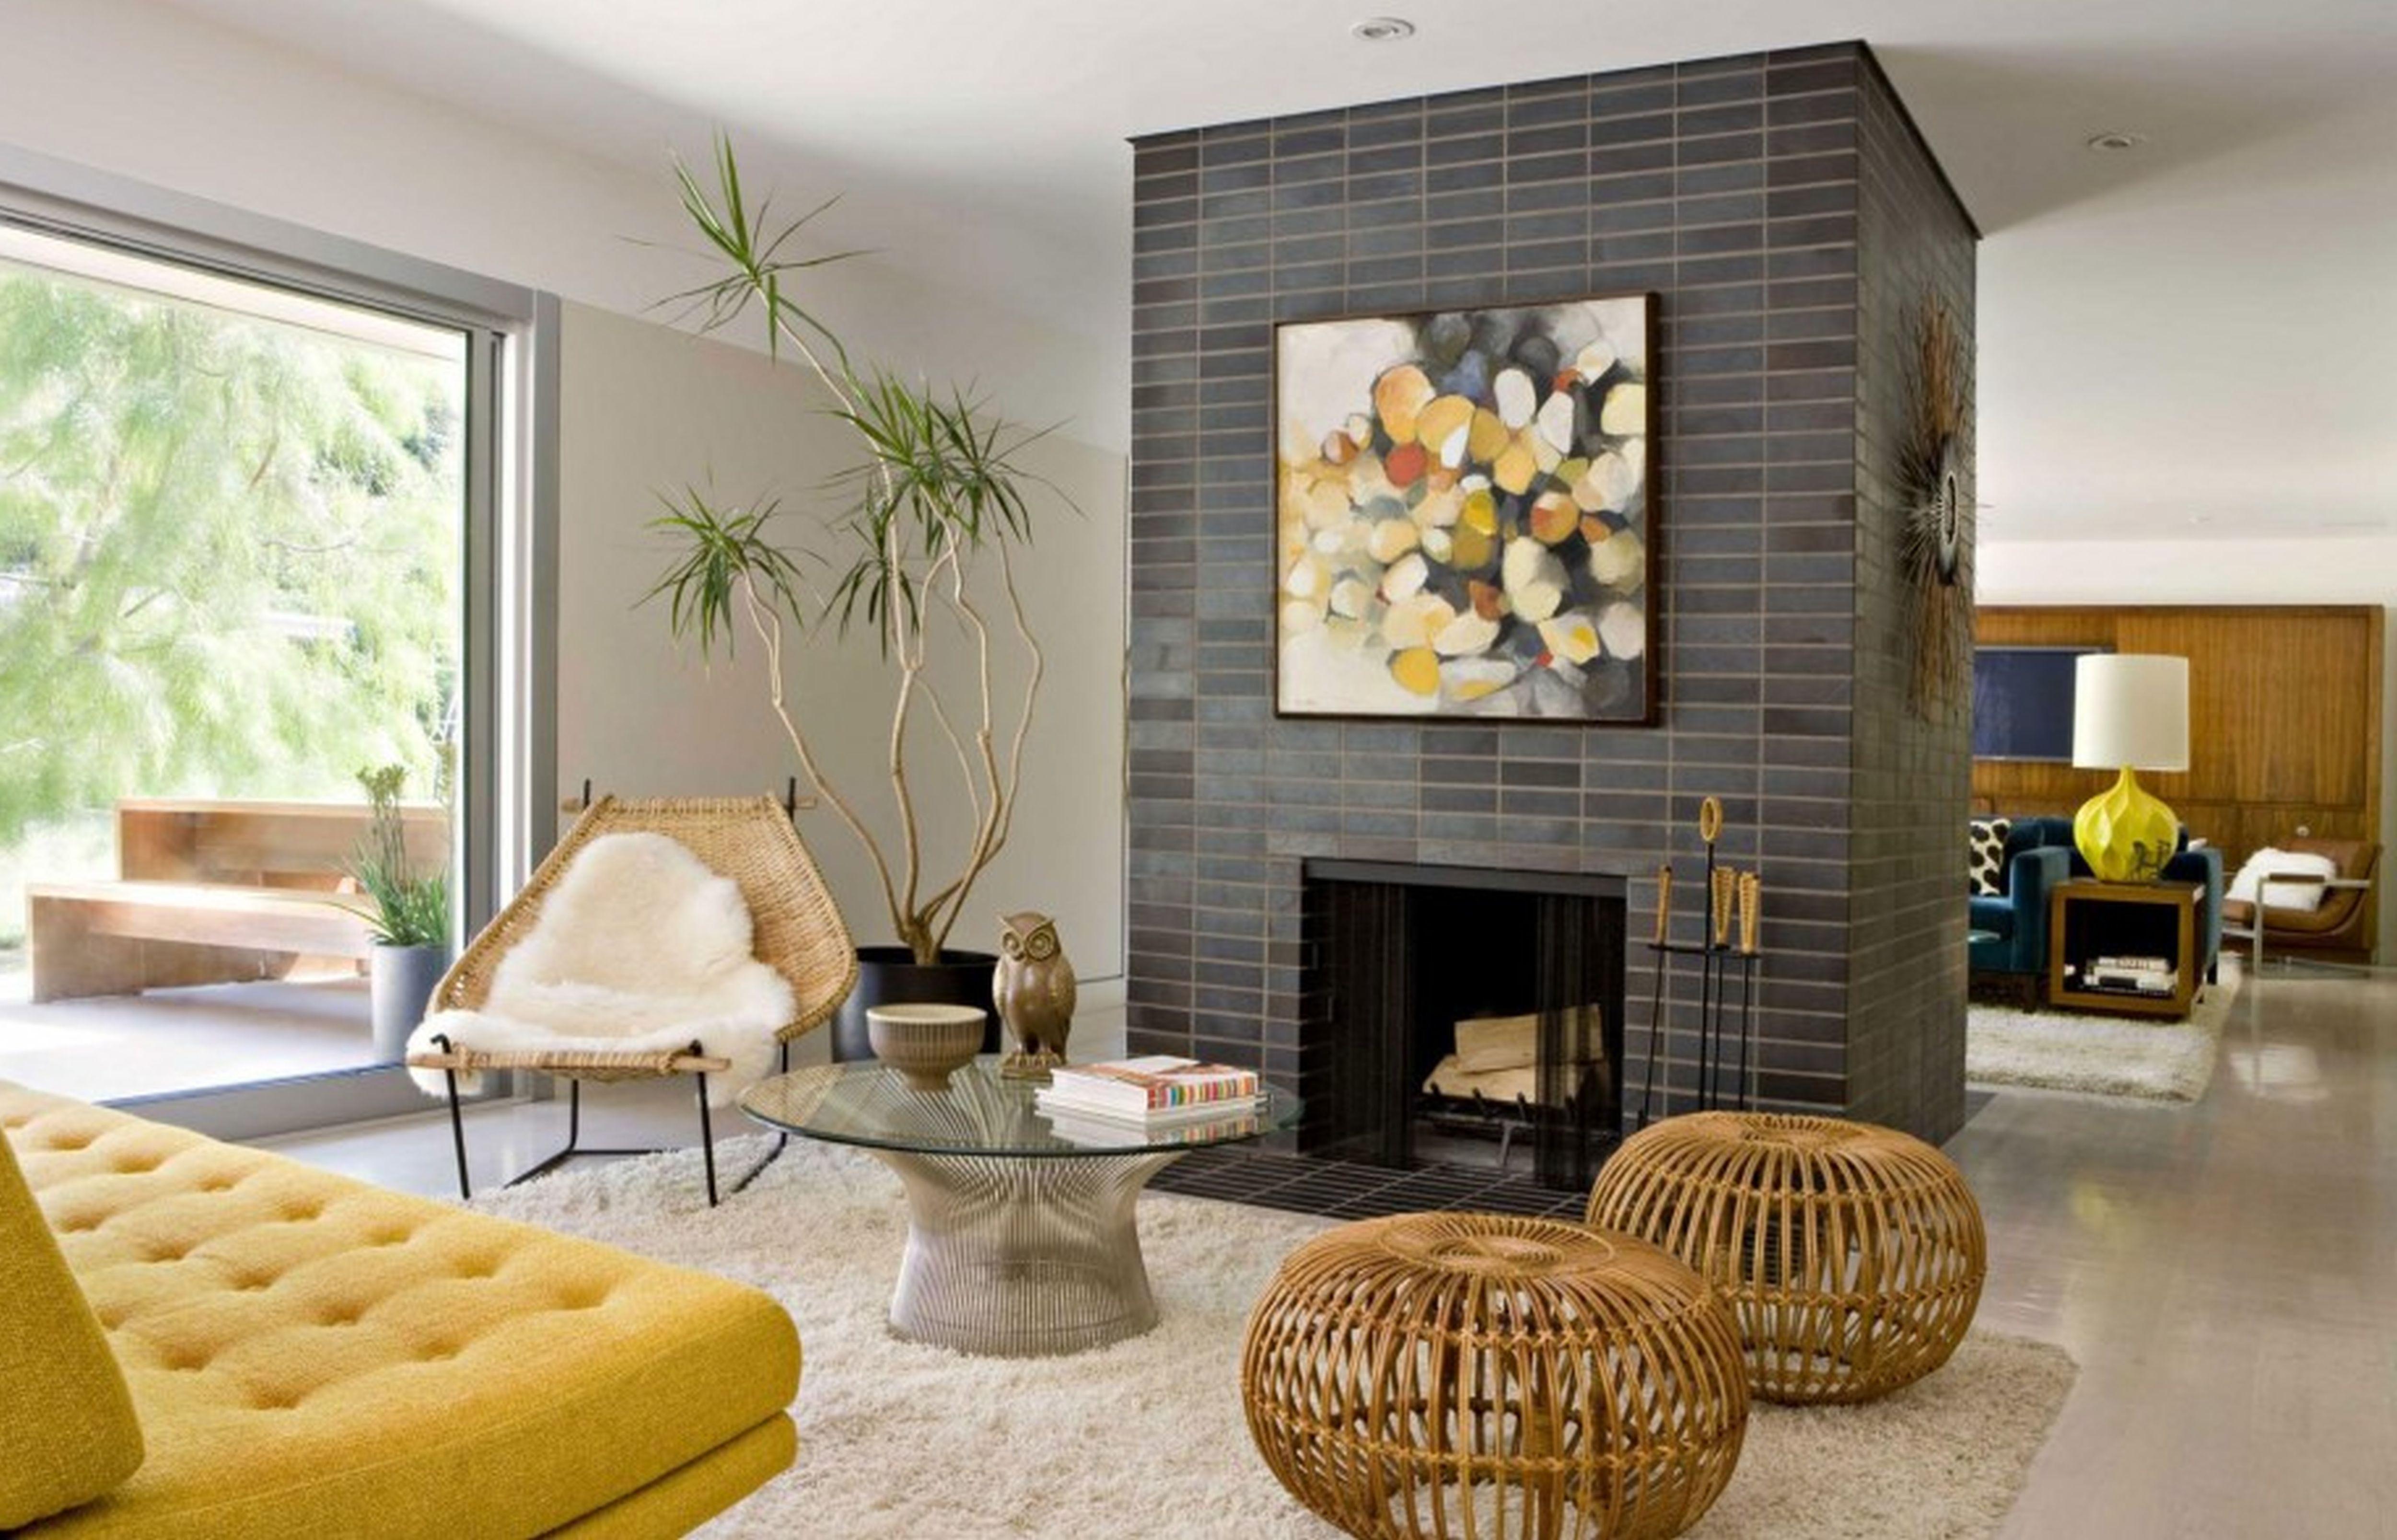 Fireplace Stone Sofa Rug Chair Table Lamp Books